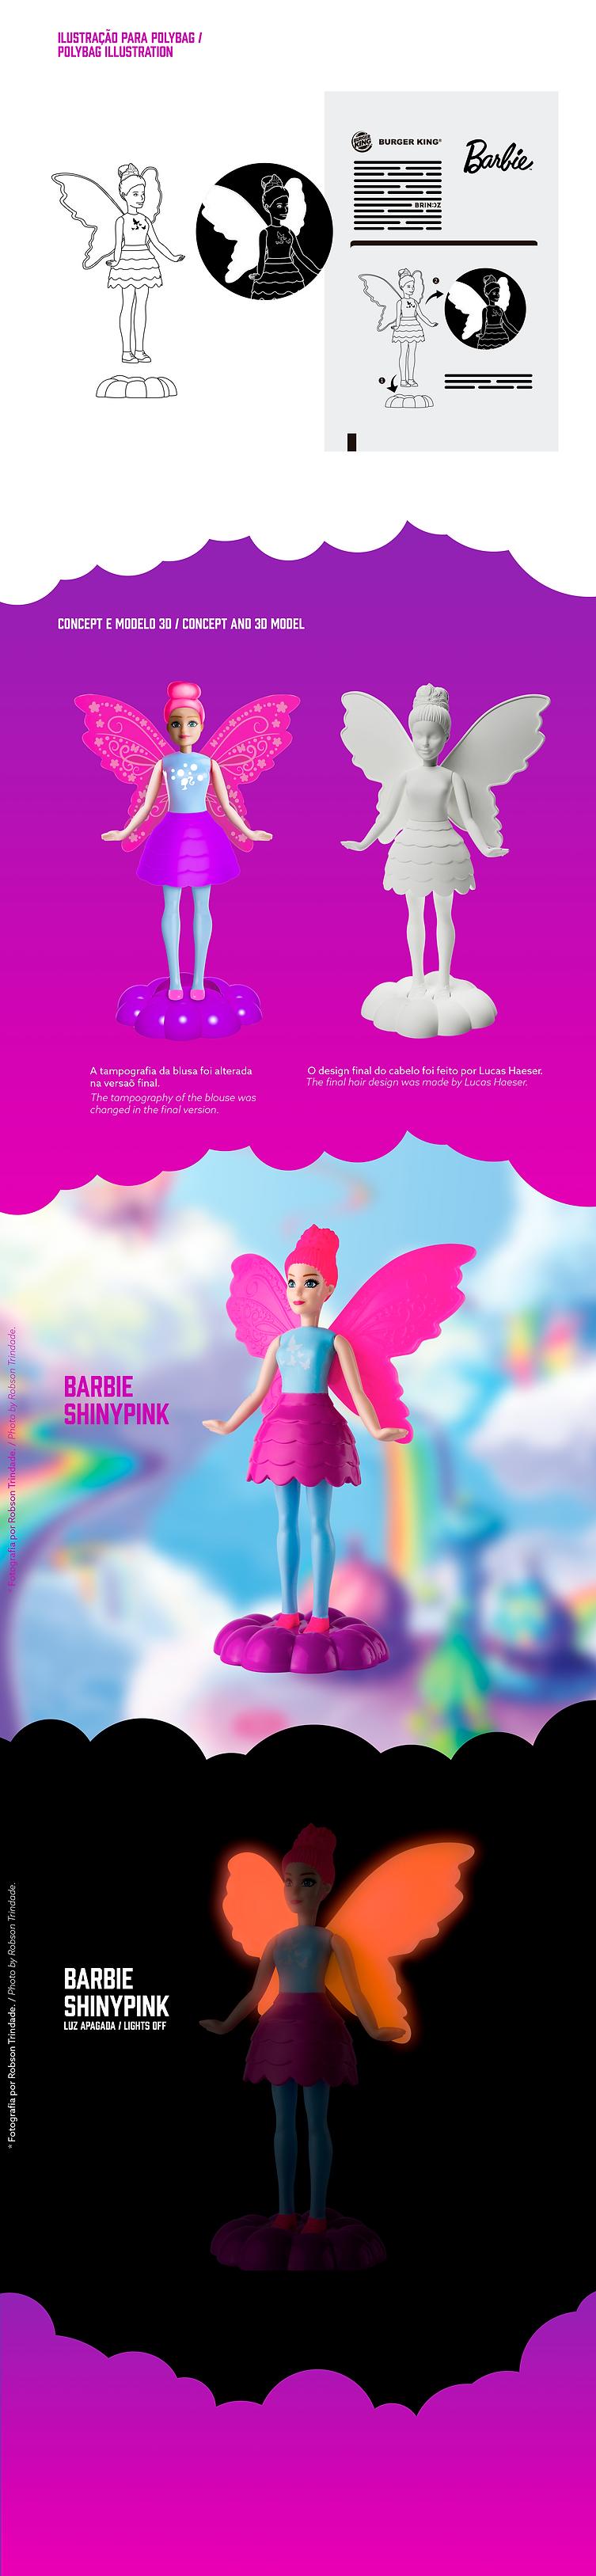 Behance---Barbie-Clouds---03B.png